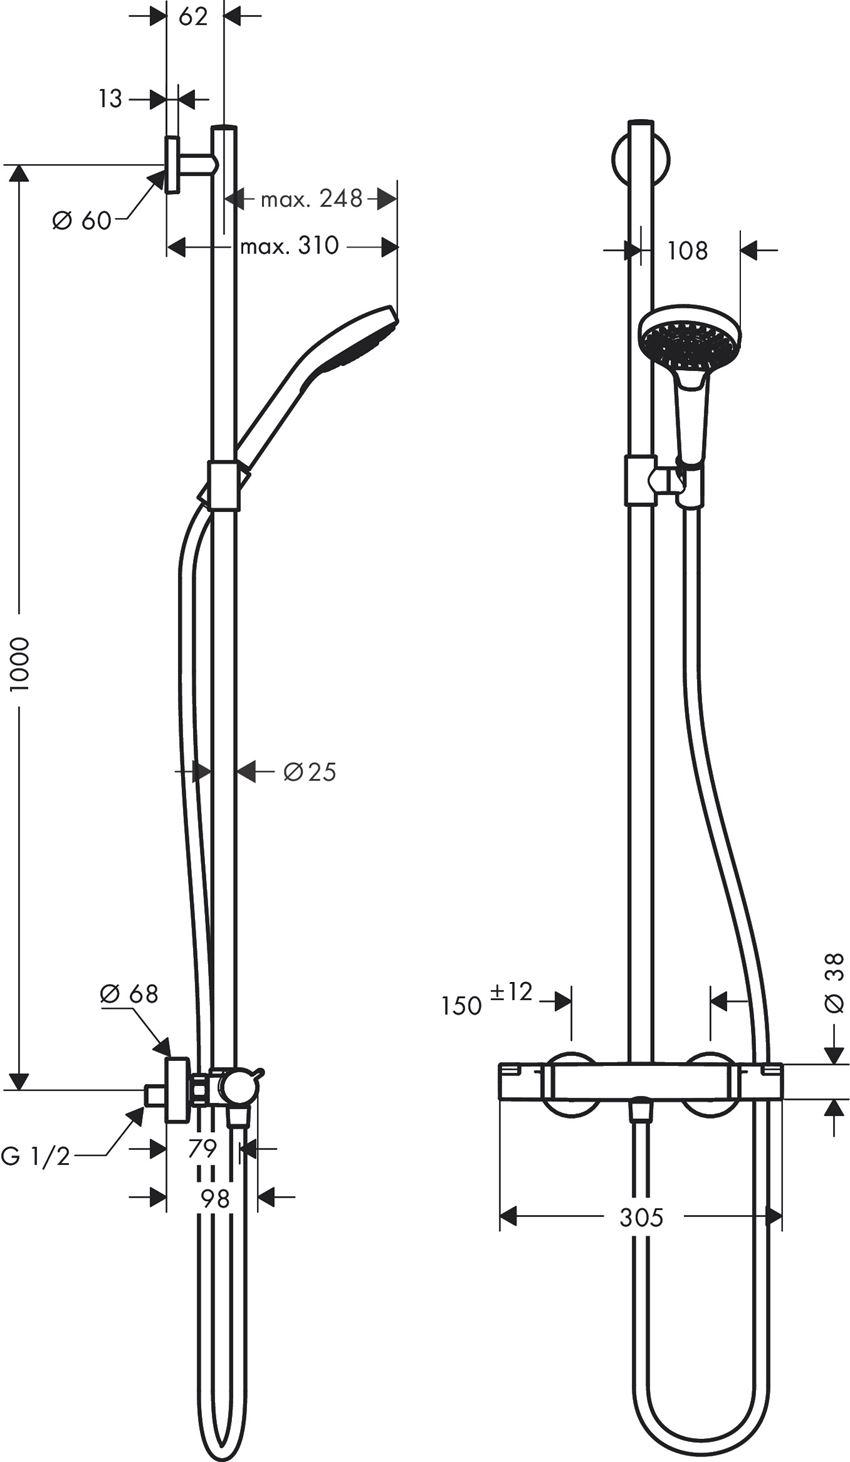 Komplet prysznicowy SemiPipe Multi z termostatem Hansgrohe Croma Select S rysunek techniczny